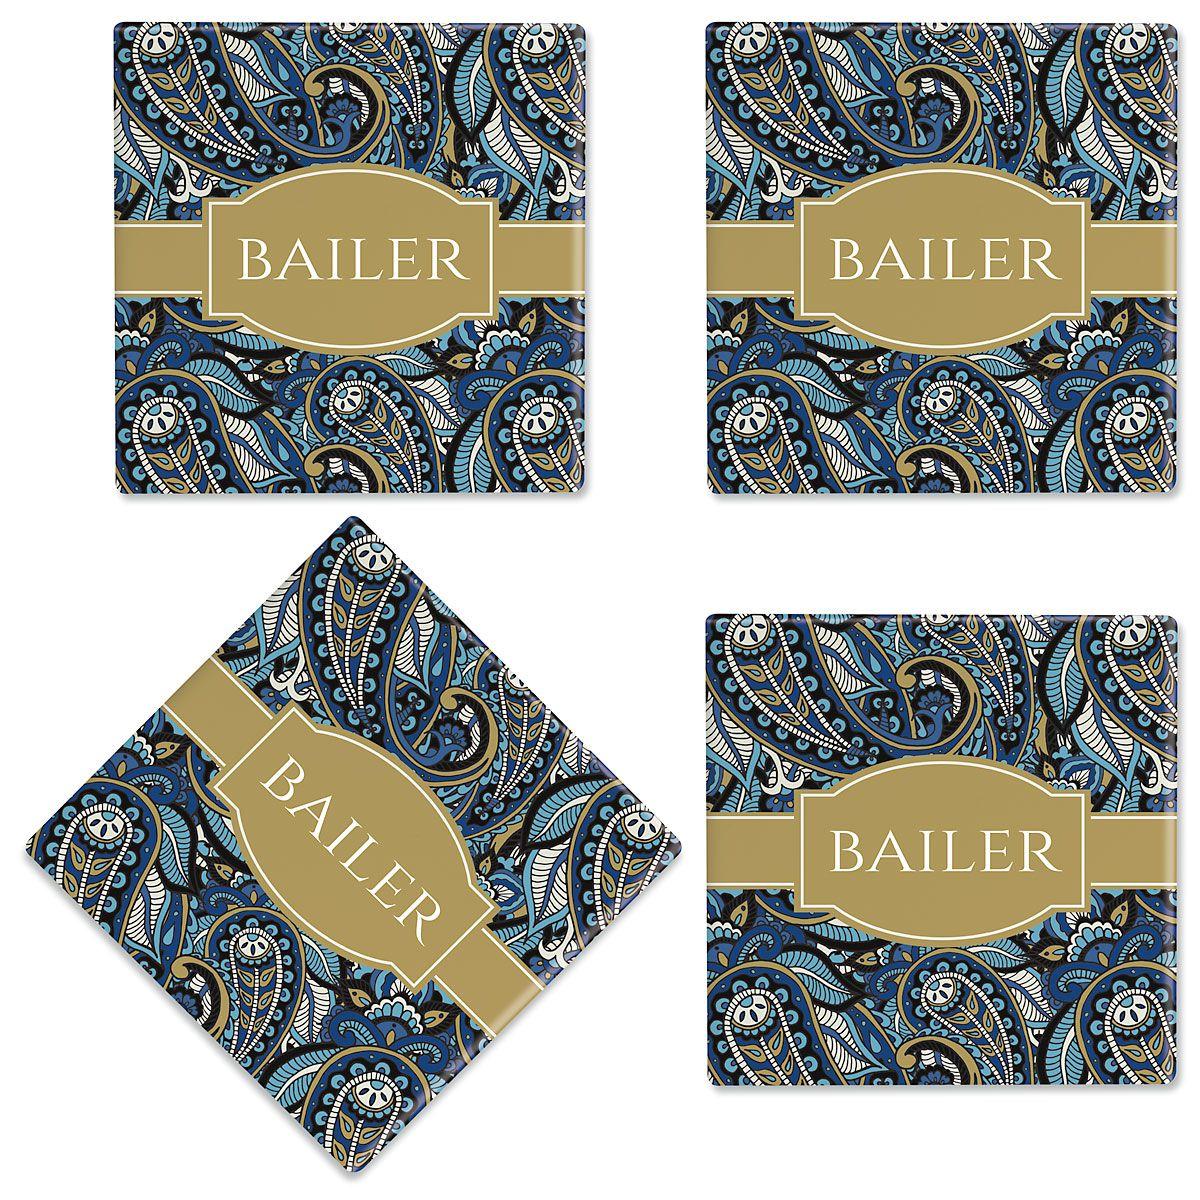 Paisley Customized Ceramic Coasters